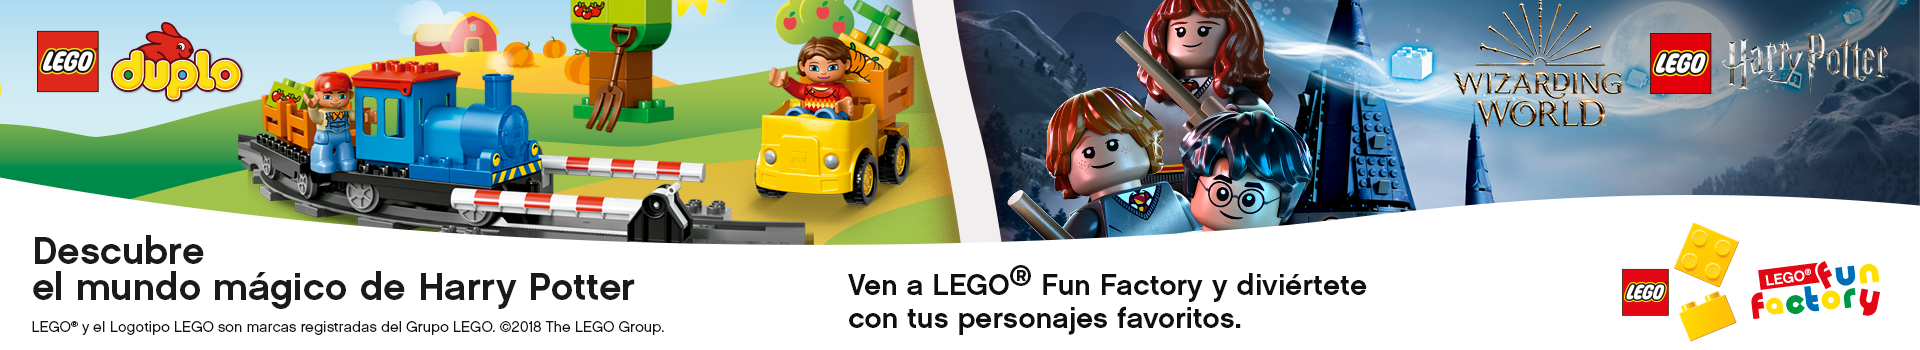 image lego fun factory